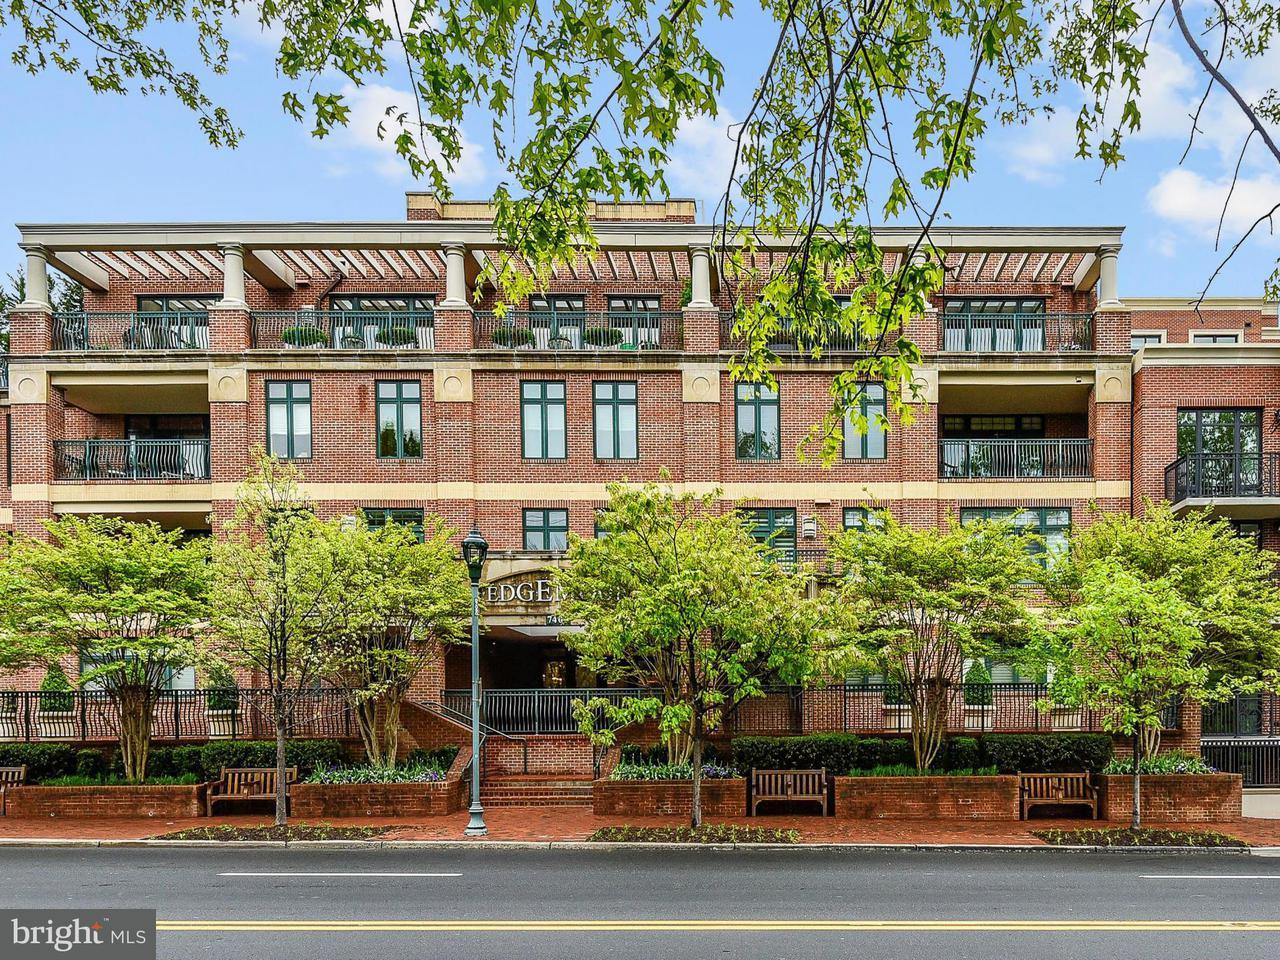 Condominium for Sale at 7405 ARLINGTON RD #401 7405 ARLINGTON RD #401 Bethesda, Maryland 20814 United States